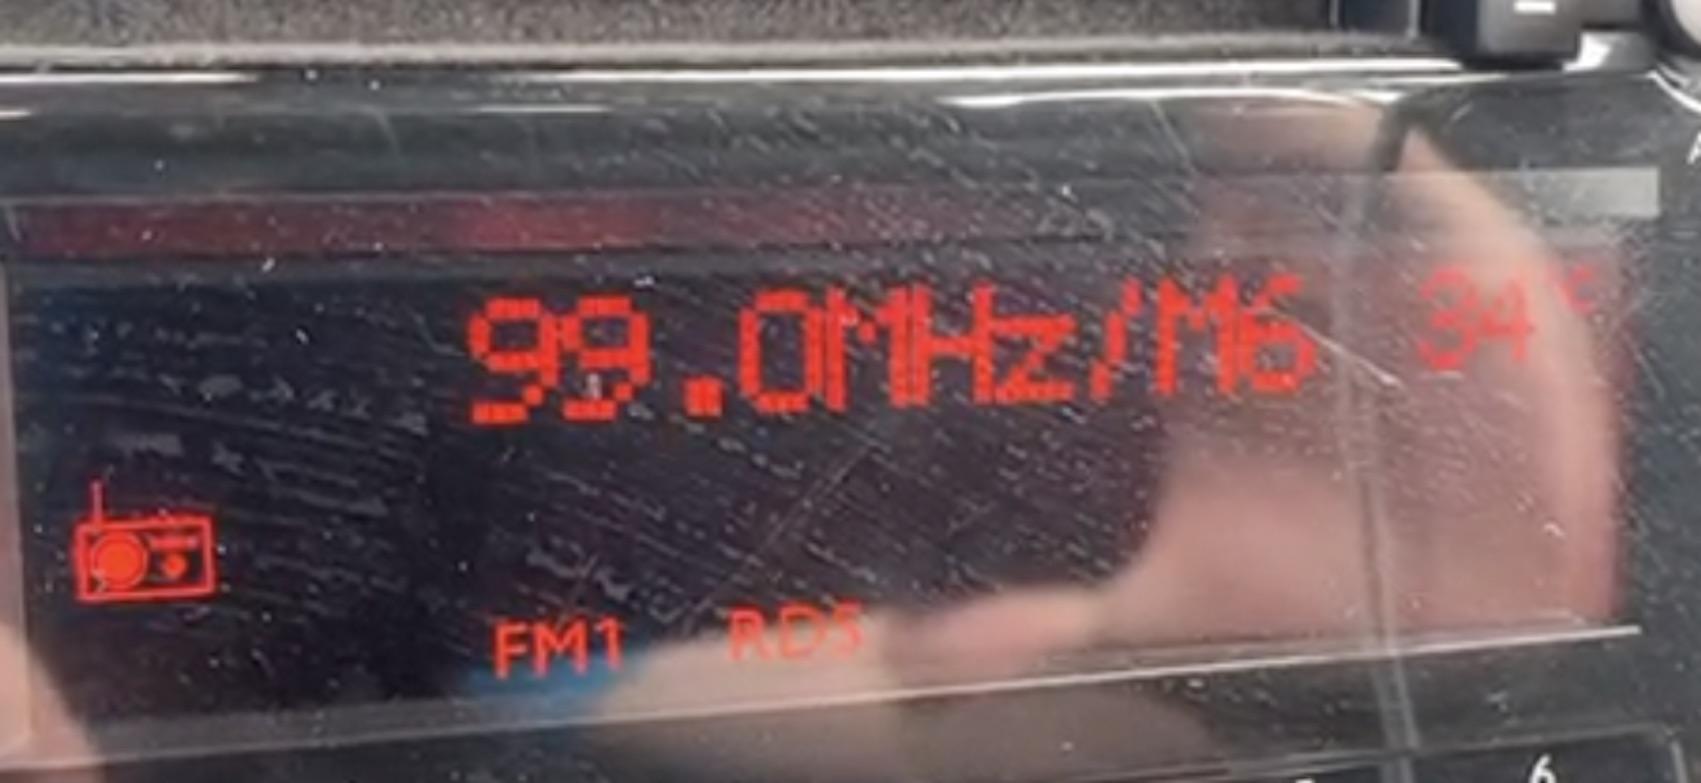 Radio Galaxy statt Radio Nikita auf 99,0 MHz (Foto: SmartPhoneFan.de)